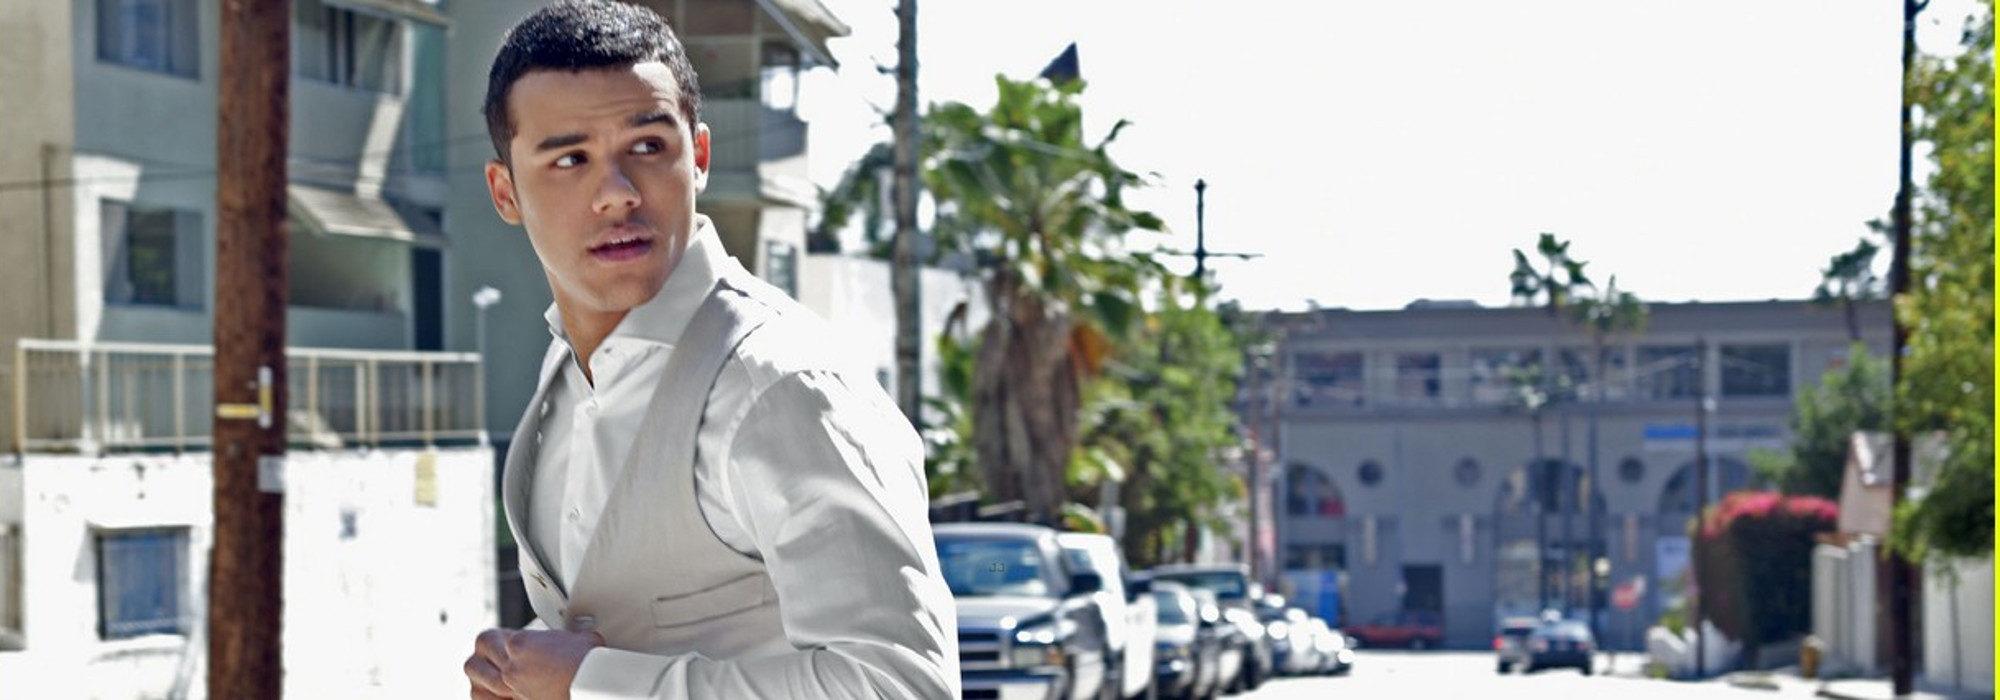 Jacob Artist ('Glee') ficha por la sexta temporada de 'American Horror Story'